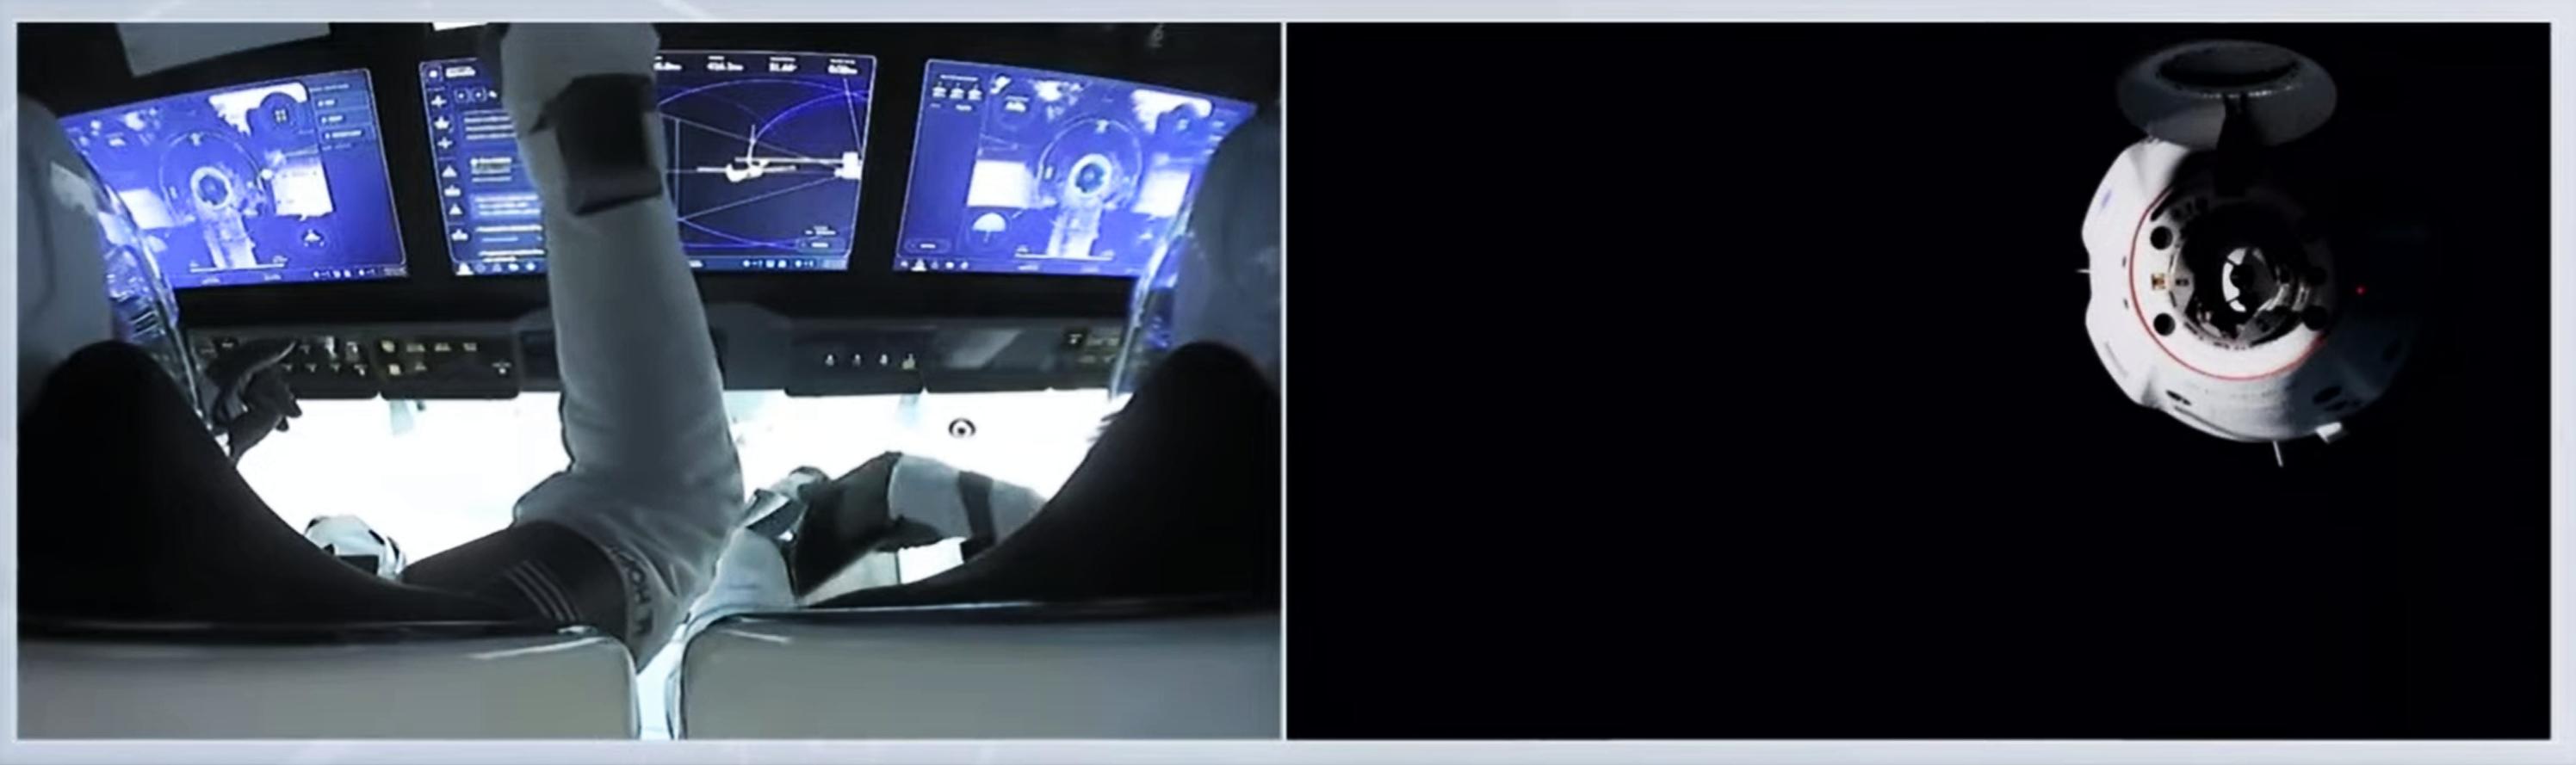 Crew-1 Crew Dragon C207 webcast 111620 (NASA) ISS approach 9